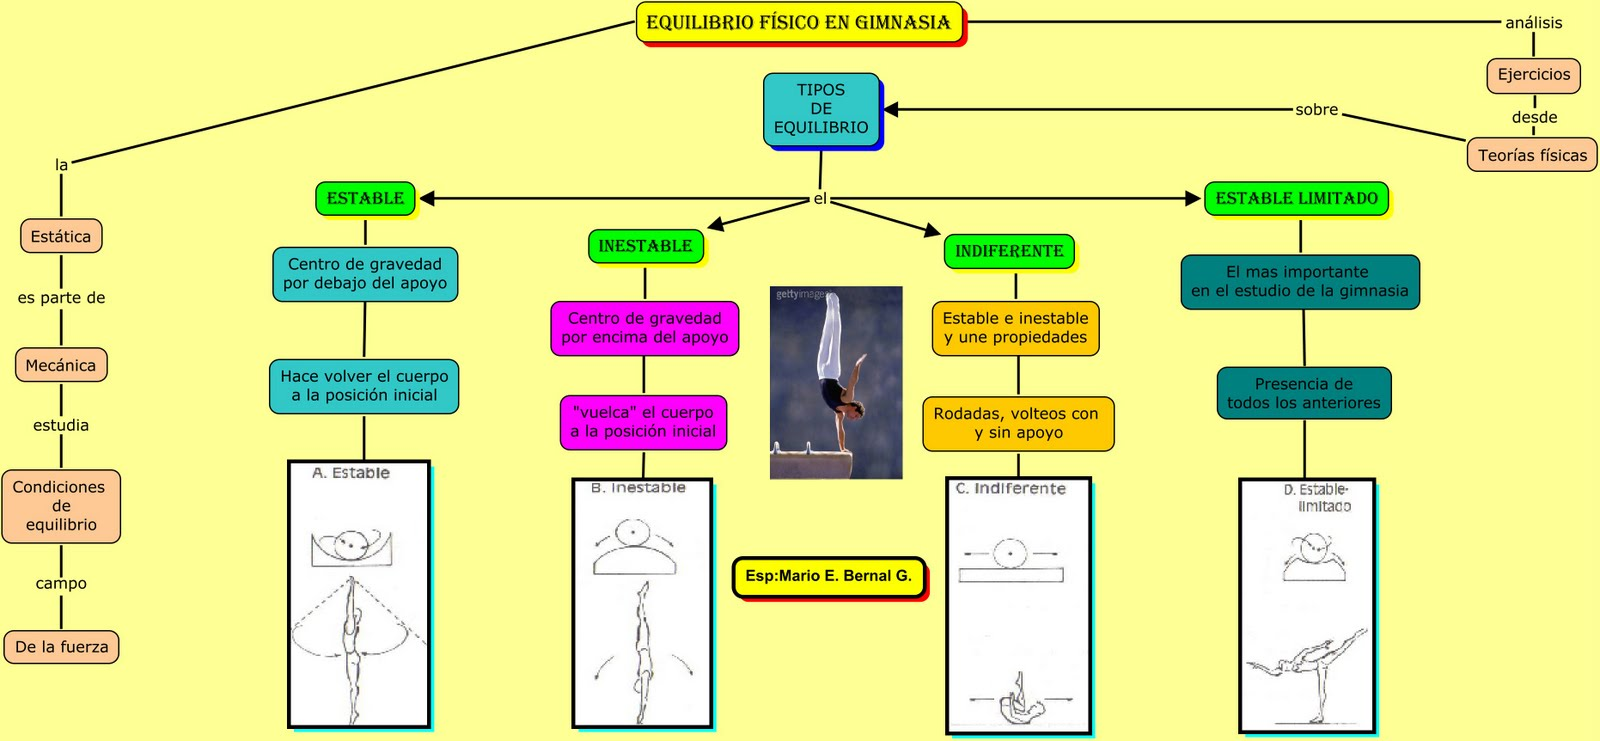 Gimnasia i mario enrique bernal gama equilibrio f sico for Gimnasia concepto